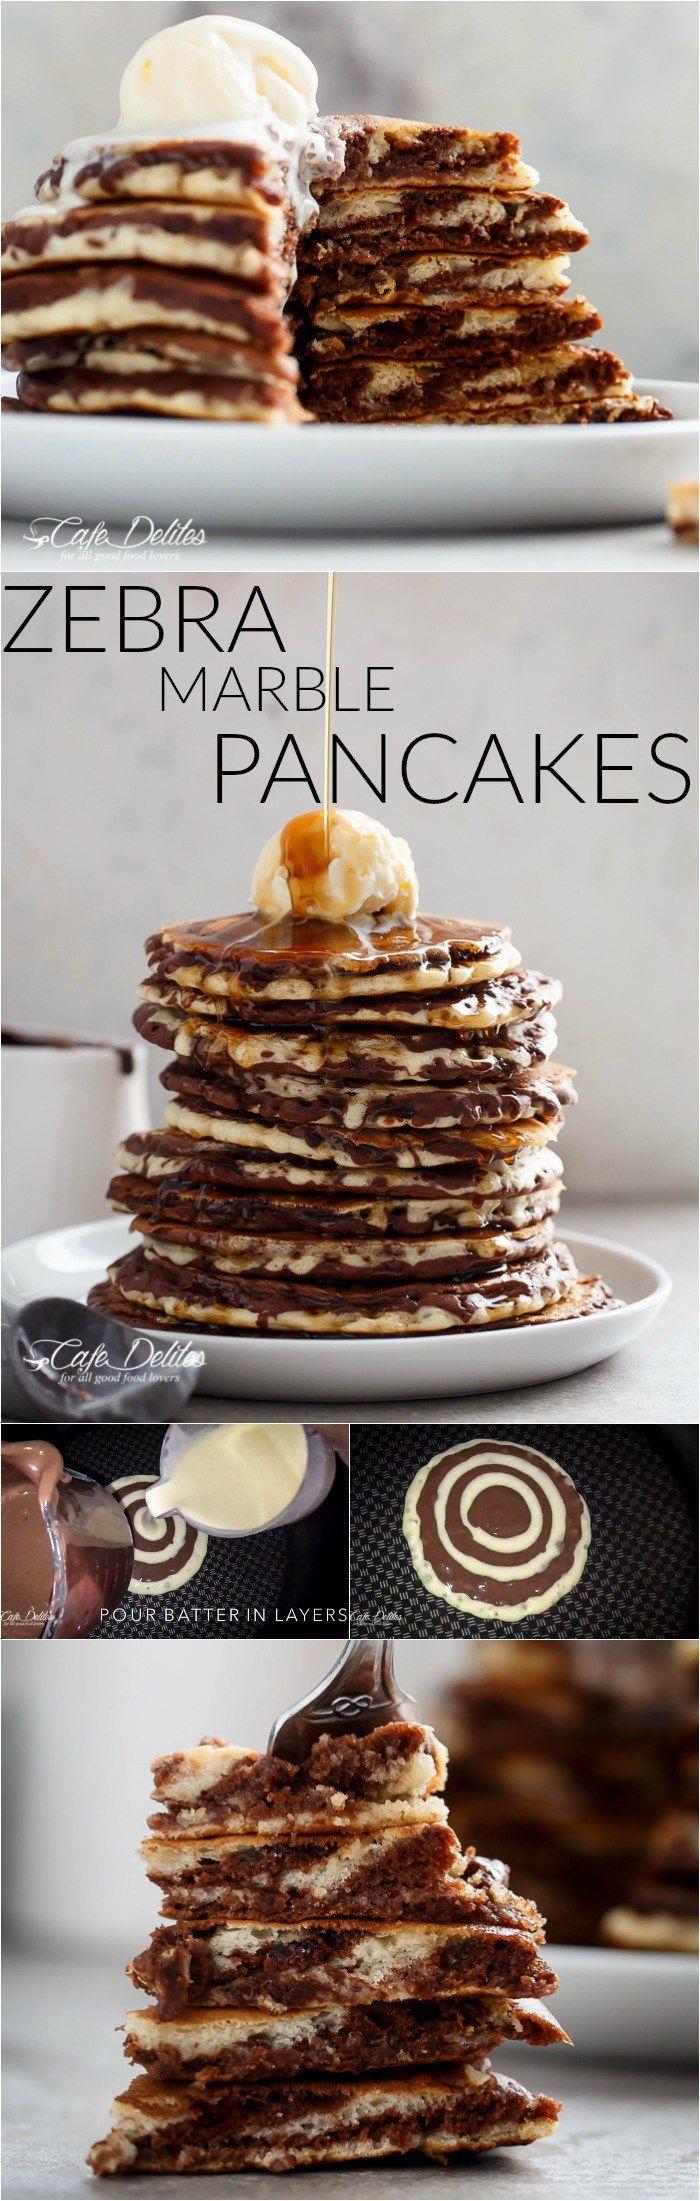 Statement Clutch - Strawberry pancakes by VIDA VIDA PYRVFlouK